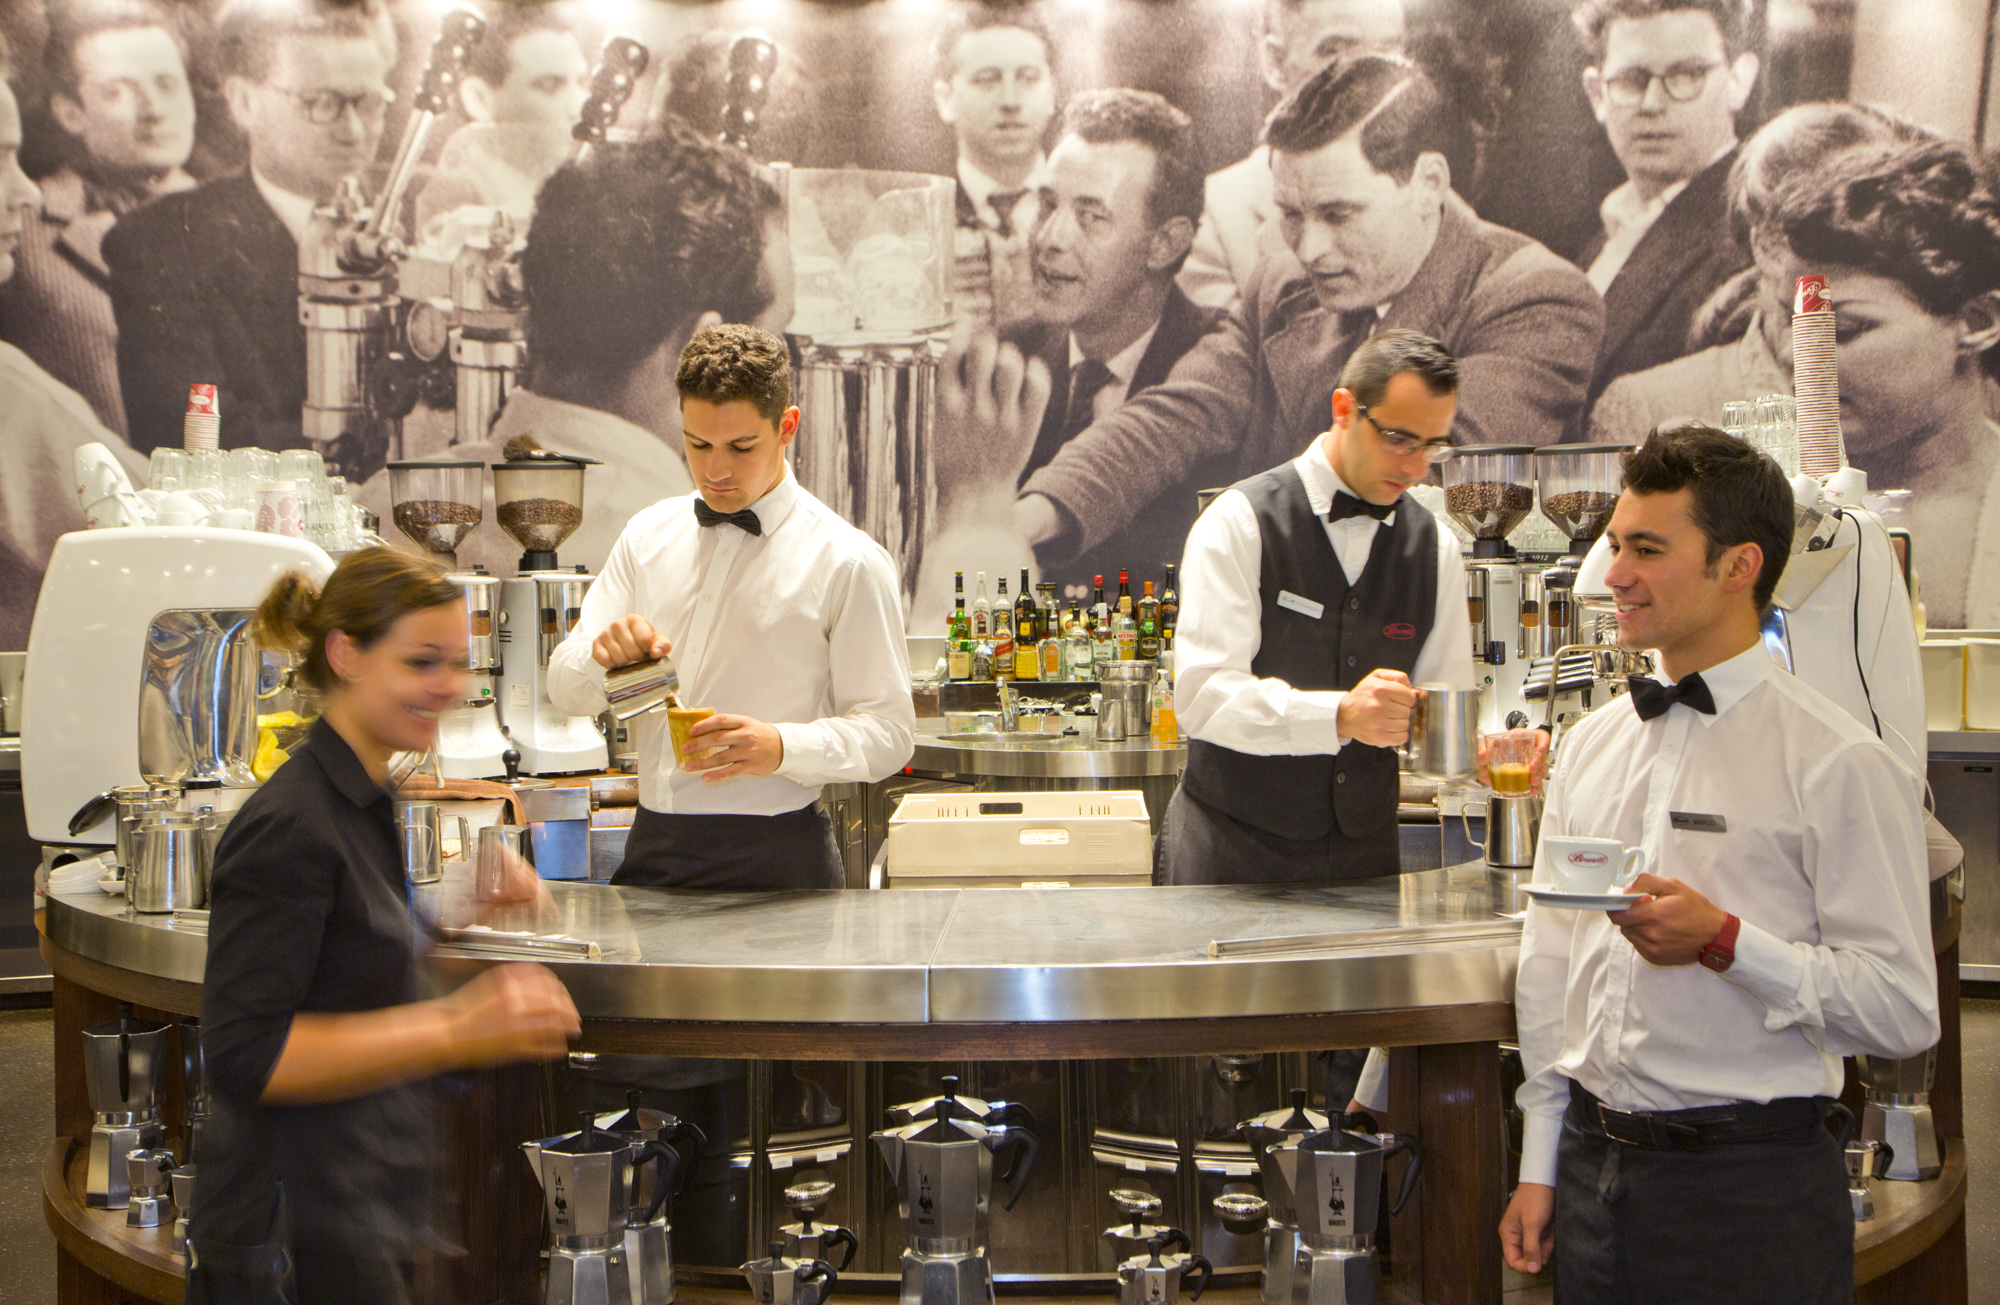 Brunetti Cafe, Kellner an den Kaffeeautomaten, Lygon Street 380, italienisches Café & Konditorei, Melbourne Australien